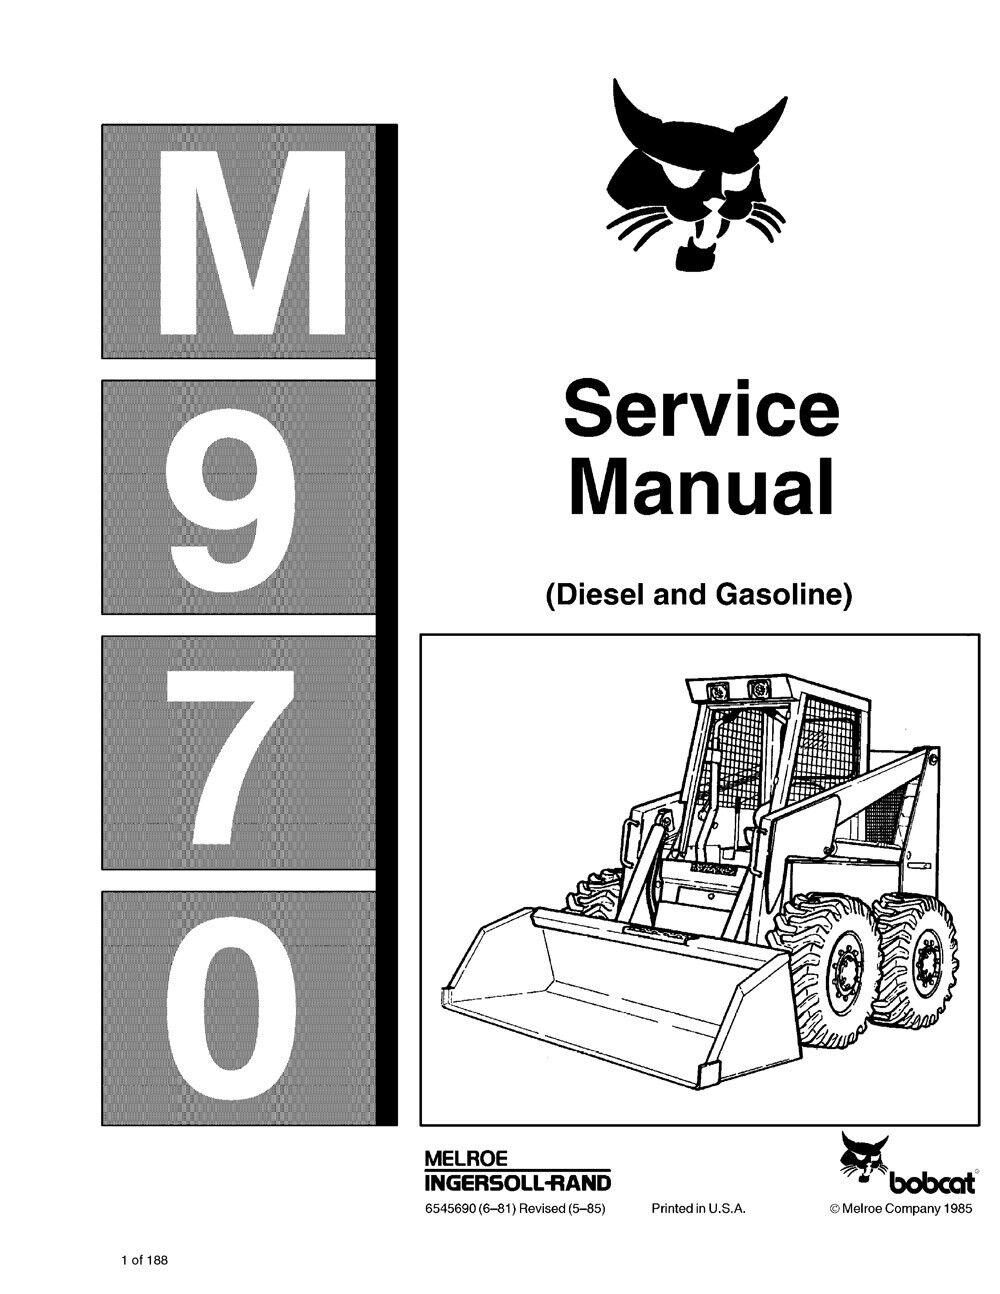 bobcat 970 skid steer loader service manual shop repair book 6545690 rh ebay com Bobcat Parts 463 Bobcat Repair Manual PDF